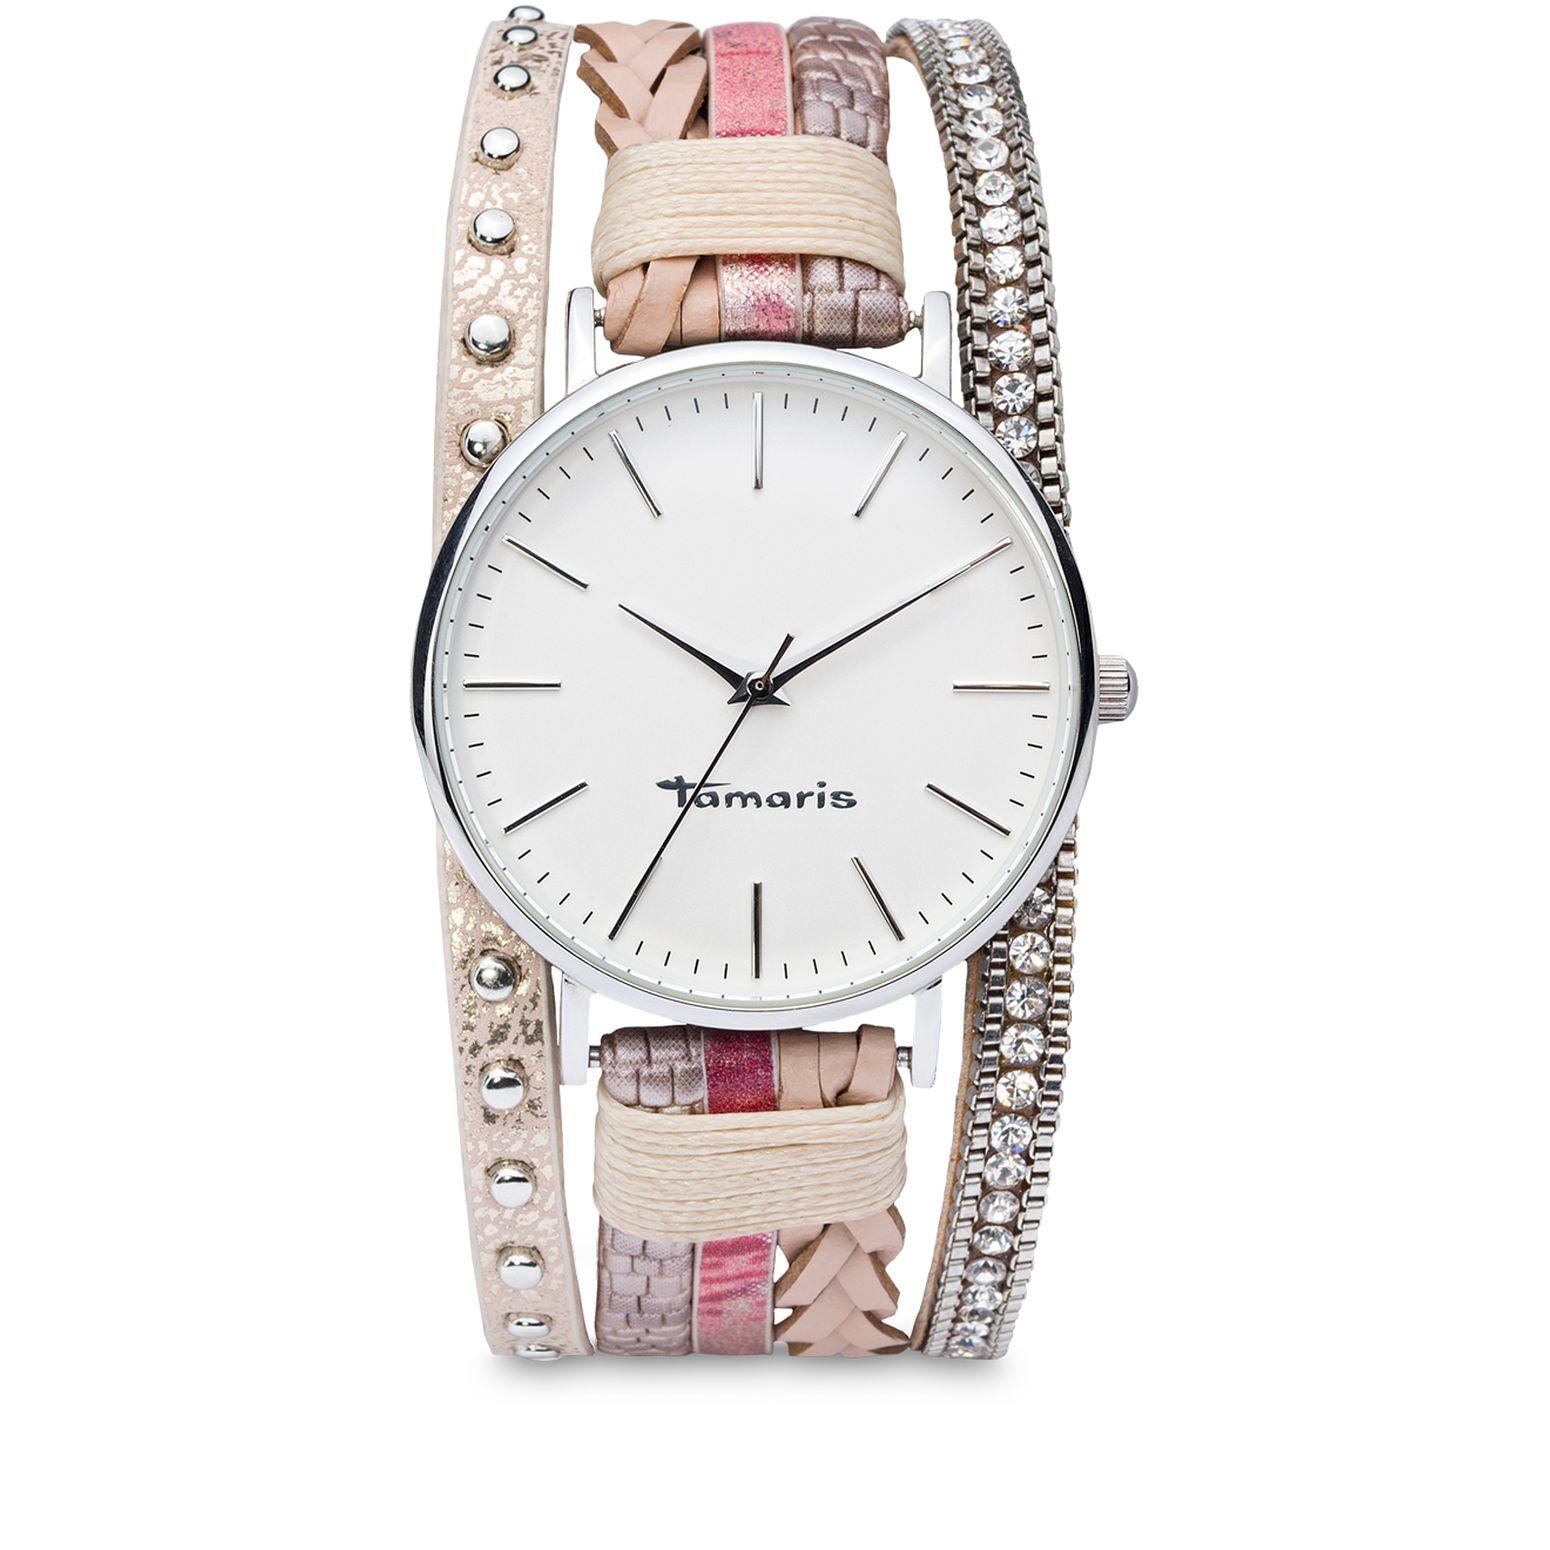 Wortmann Uhren kyla e04013420 7100 one size tamaris uhren kaufen